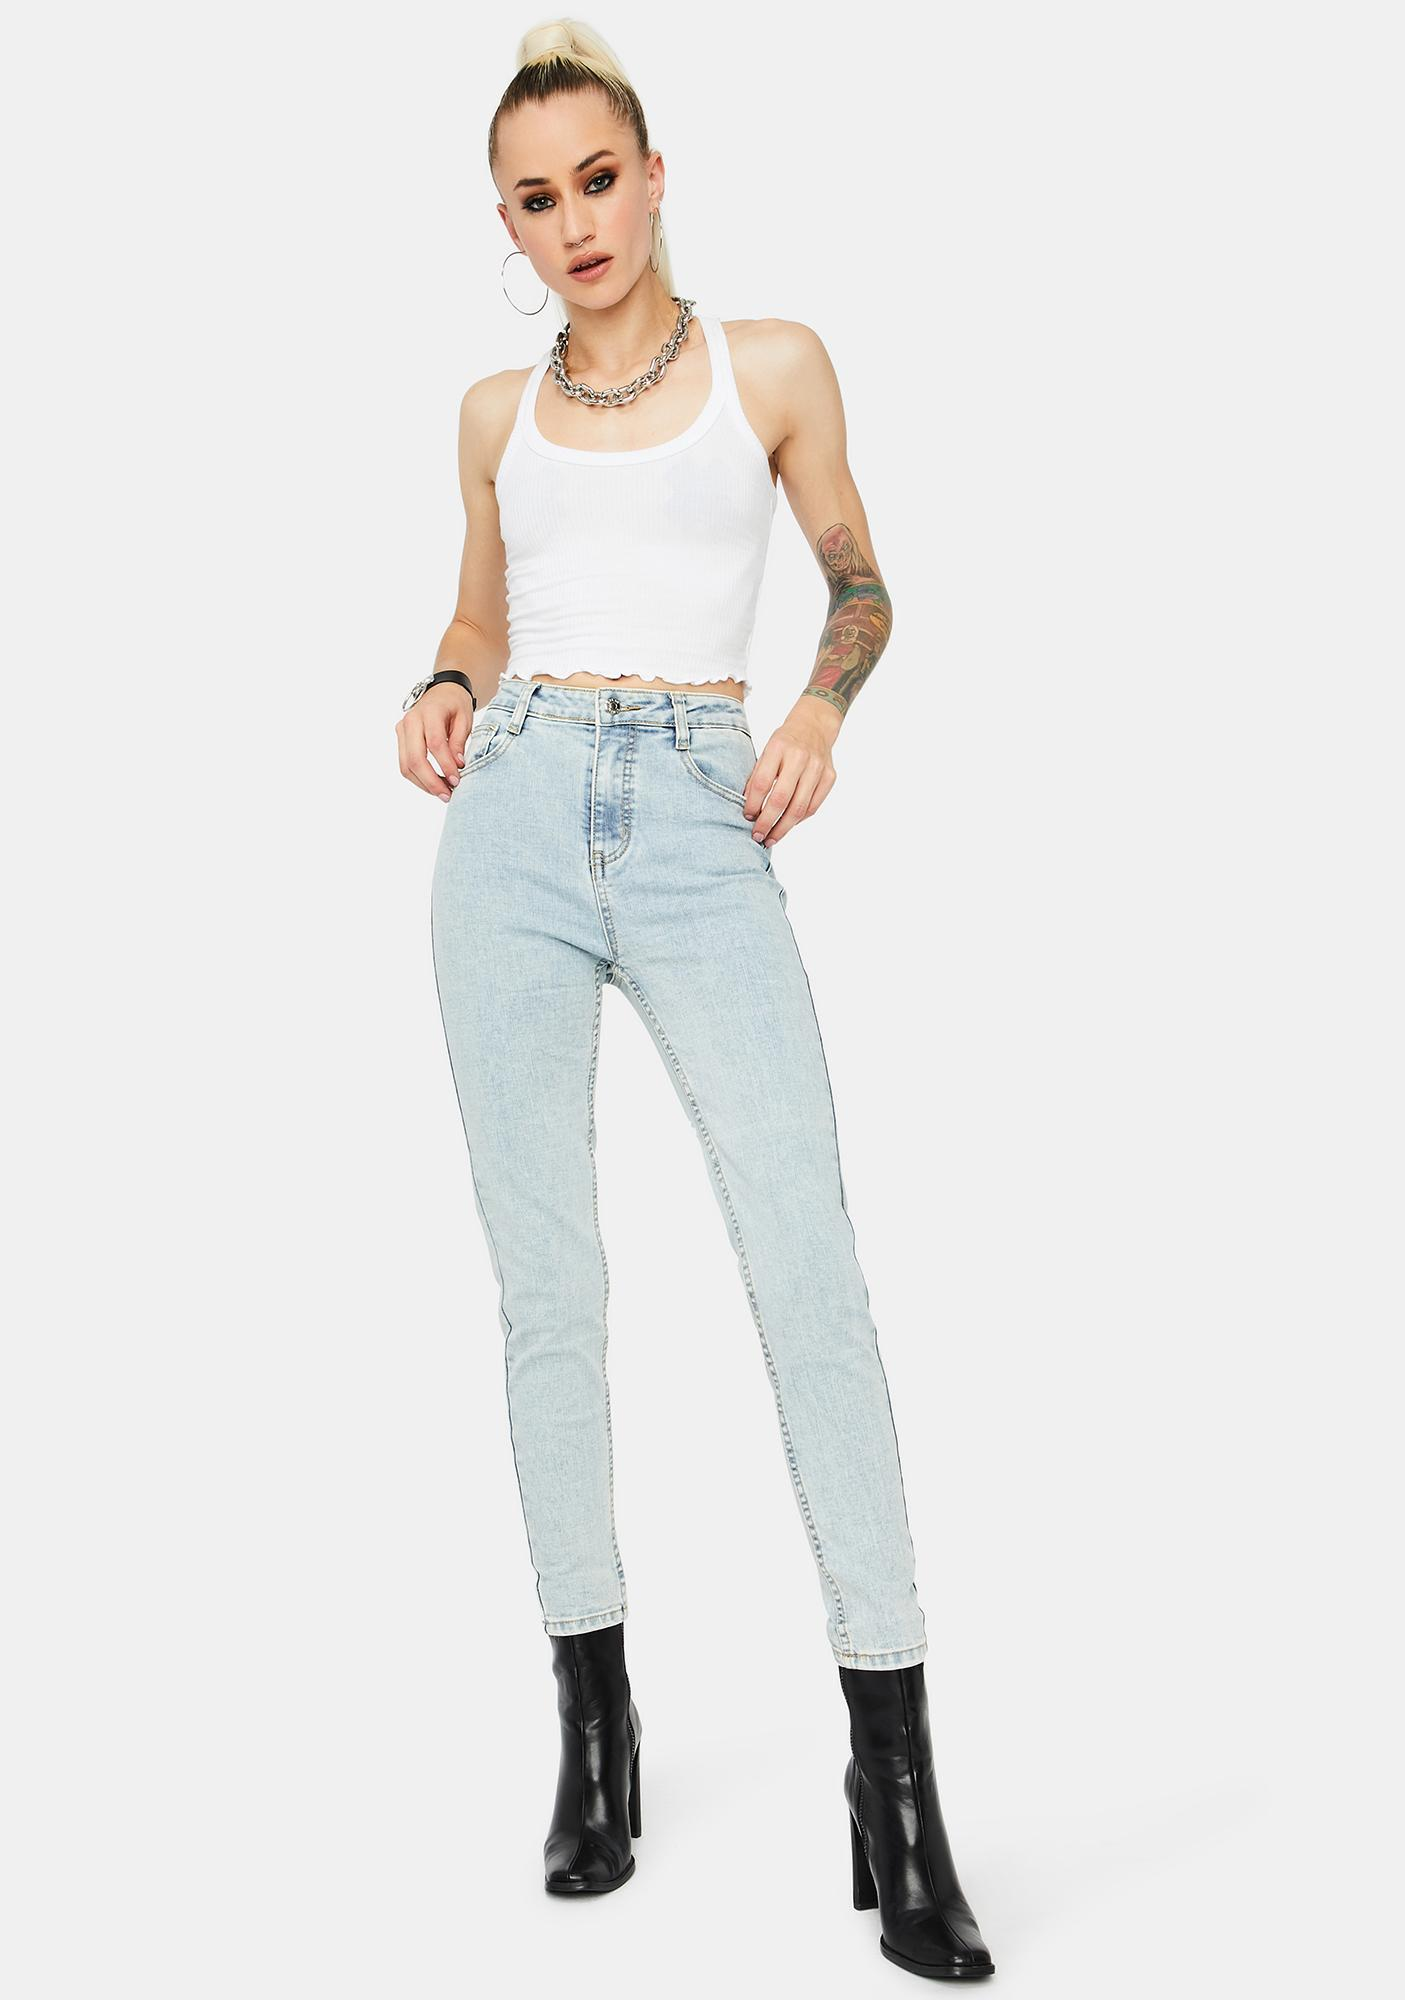 BY DYLN Carson Denim Jeans